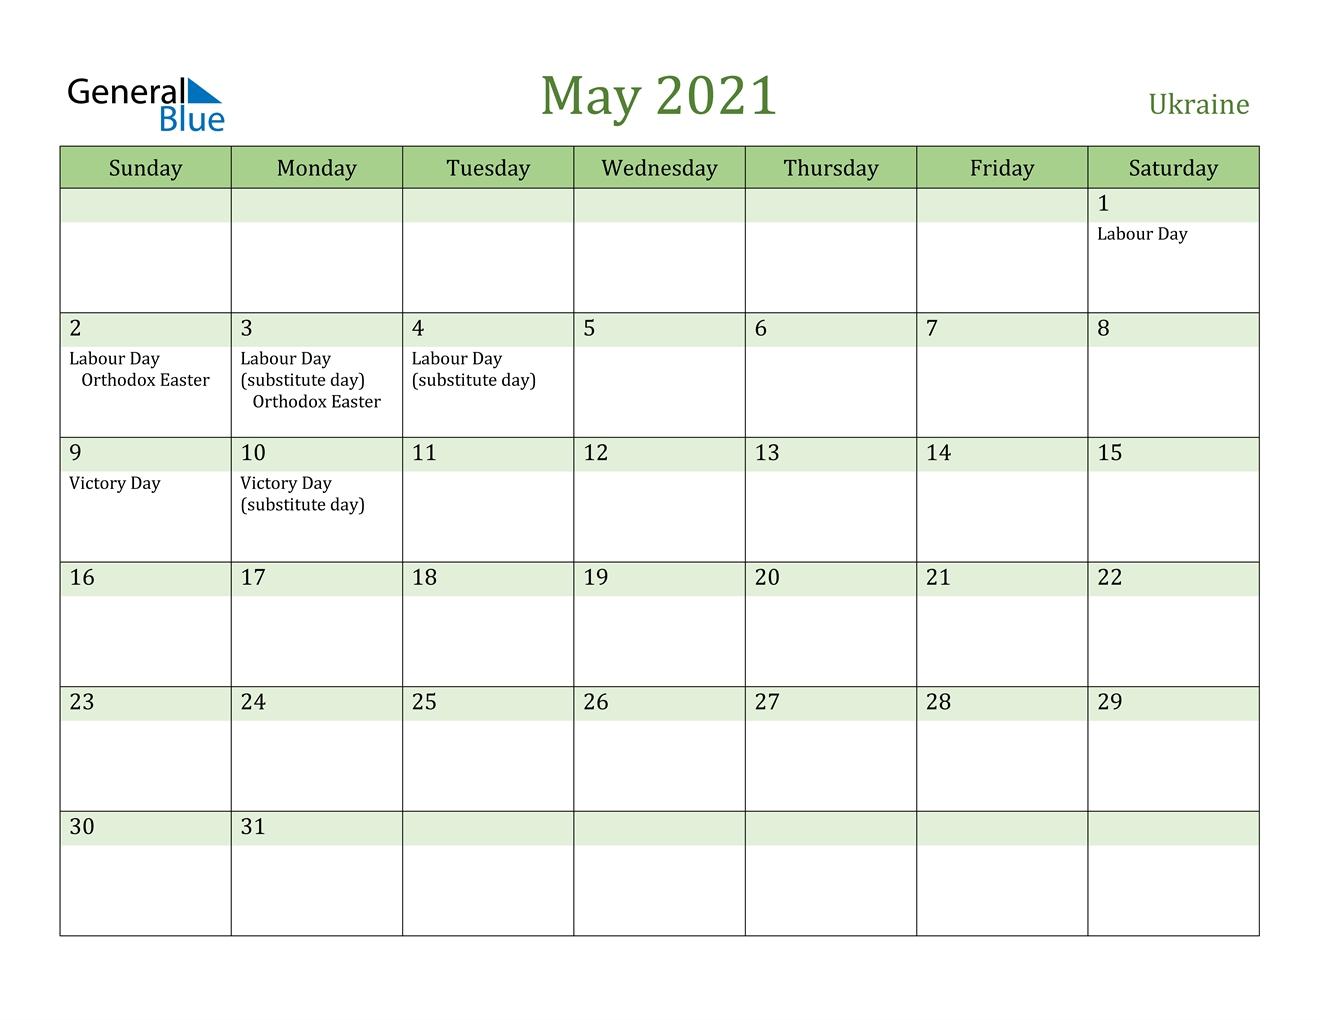 Ukraine ::may 2021 calendar with holidays